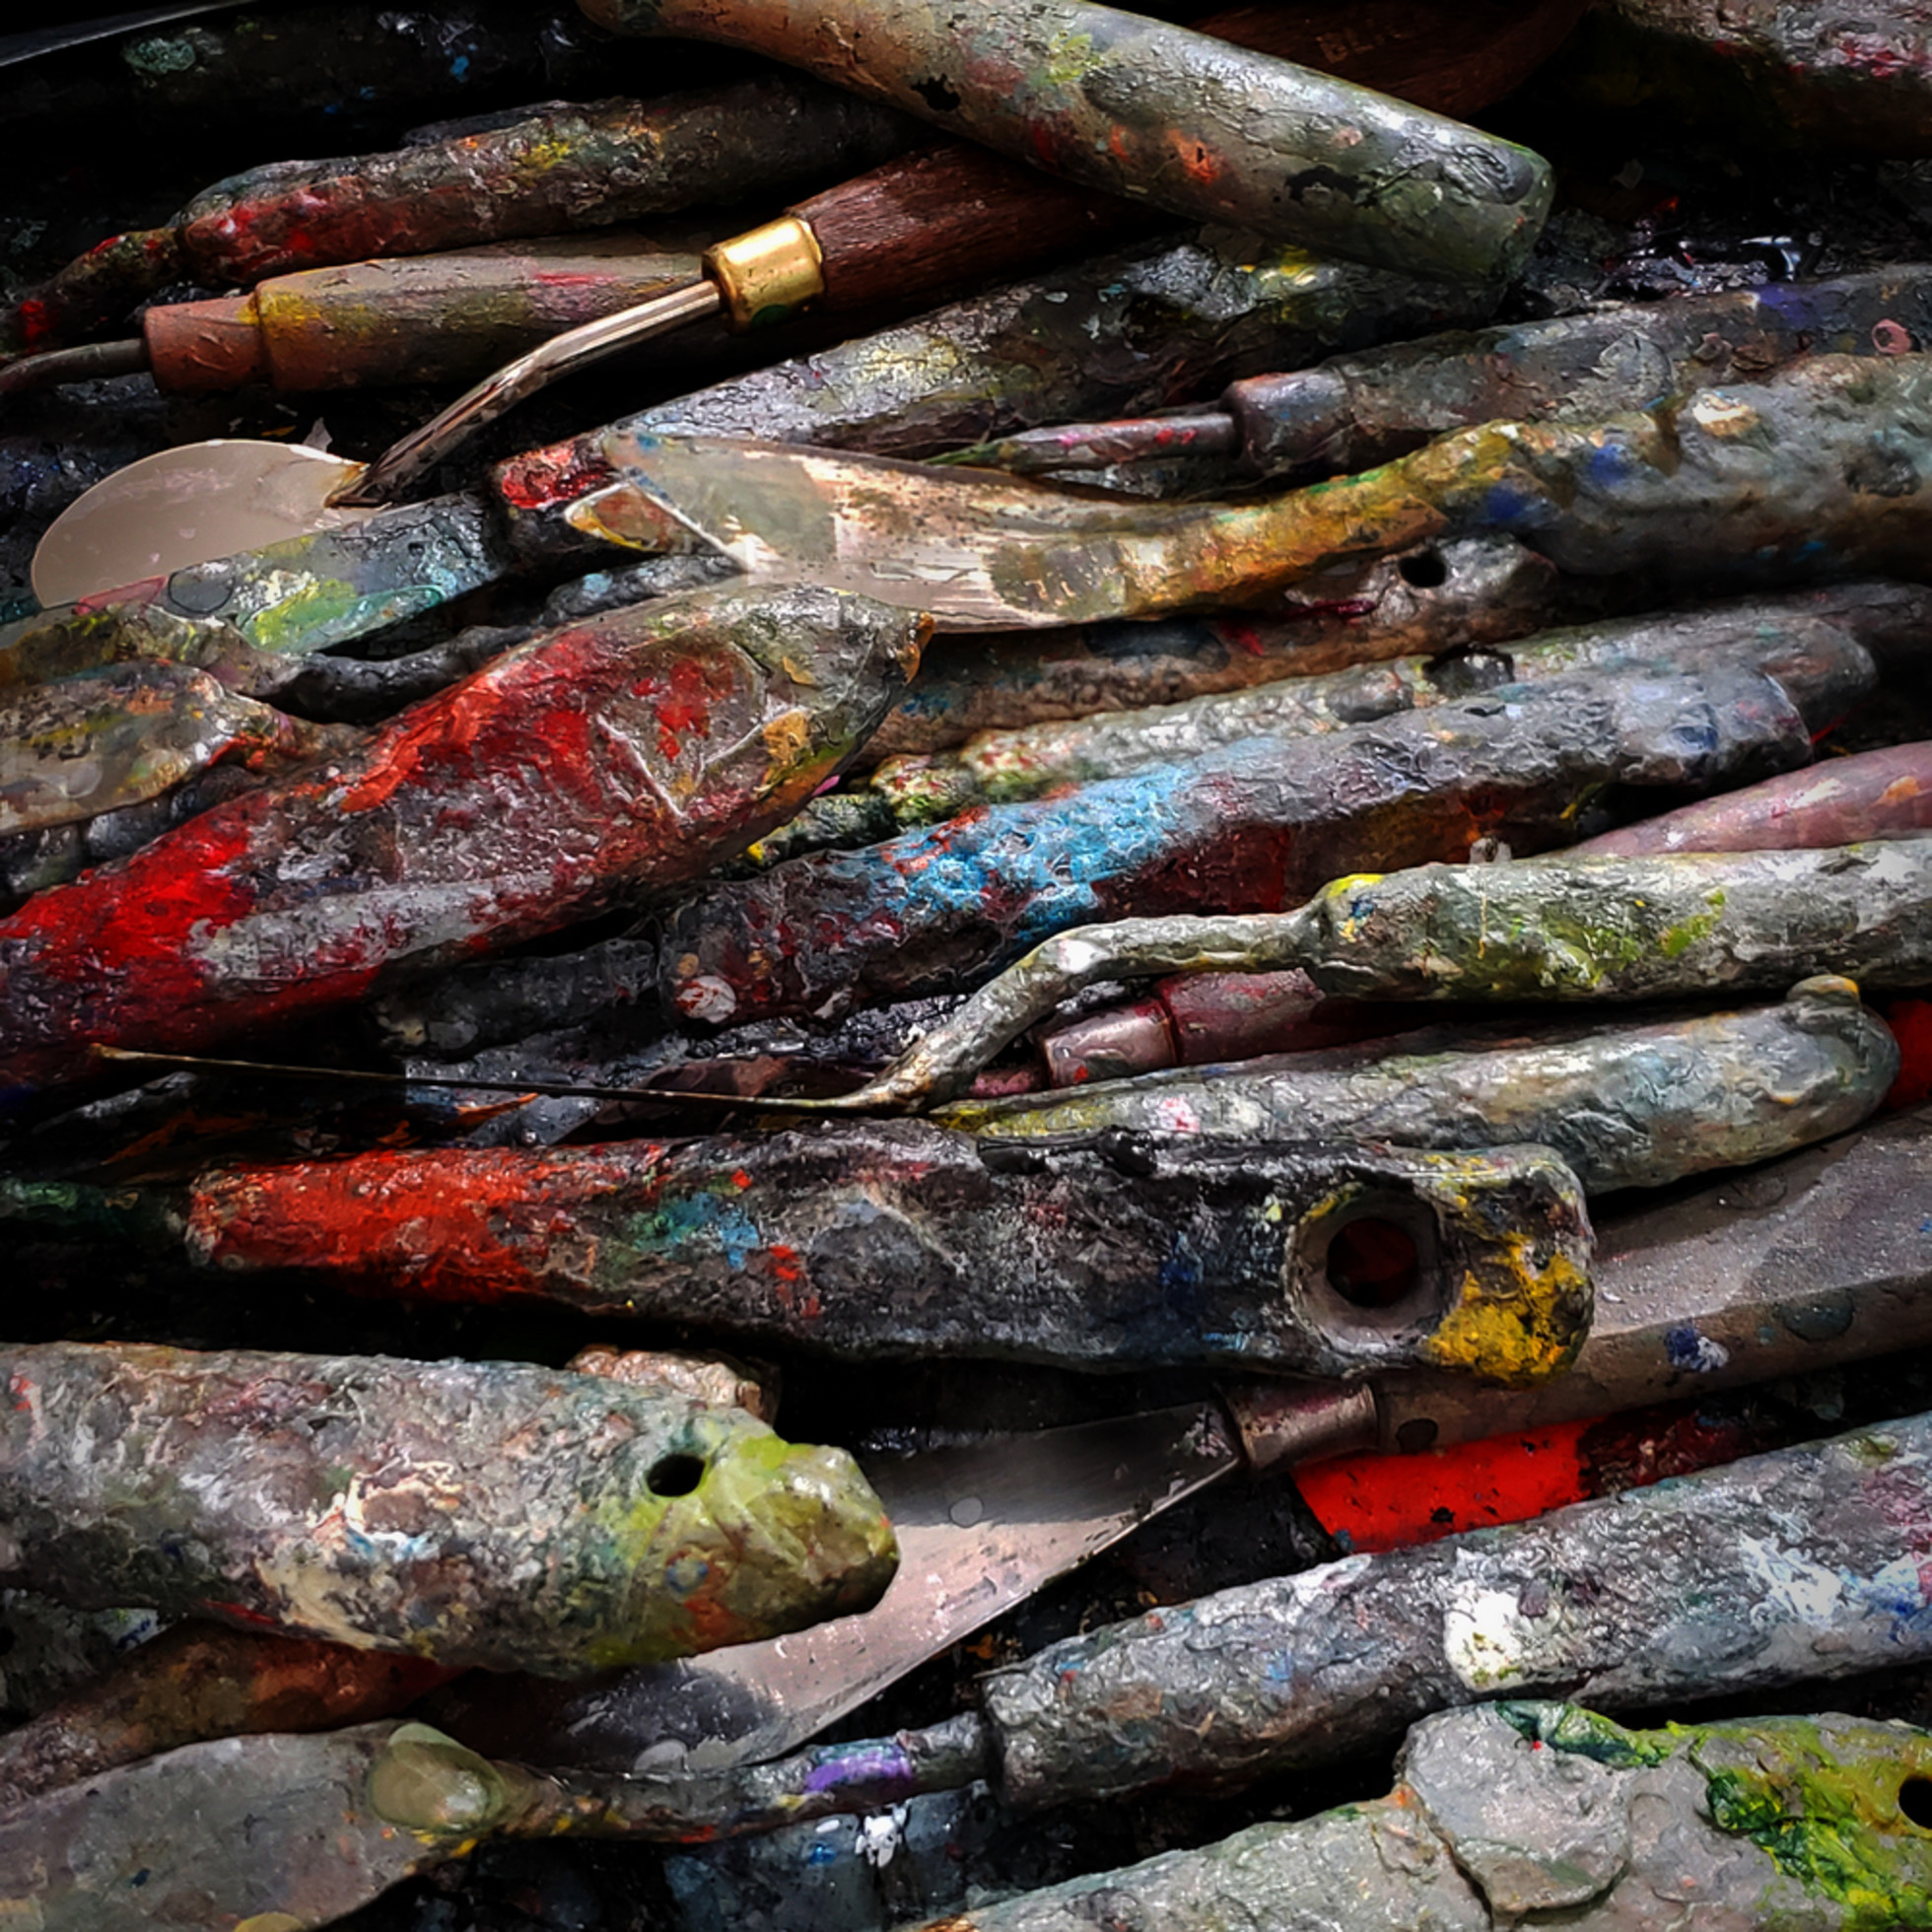 Palette knives sausolito ca ifbtcm